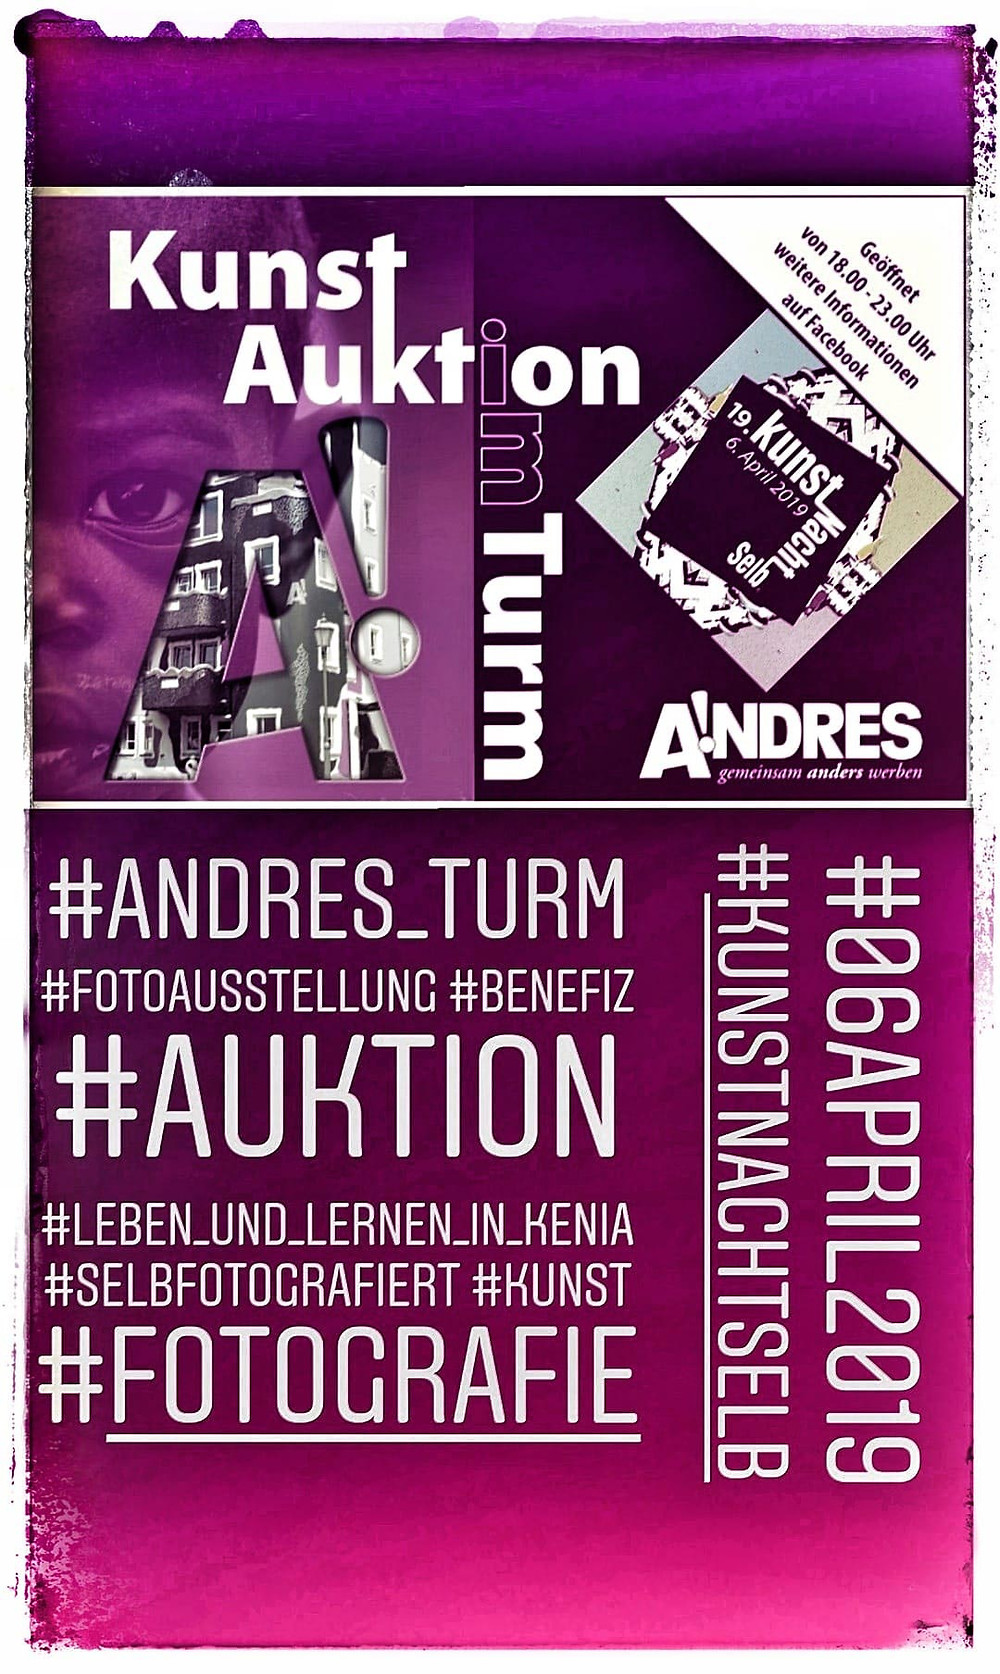 Foto: Andres GmbH